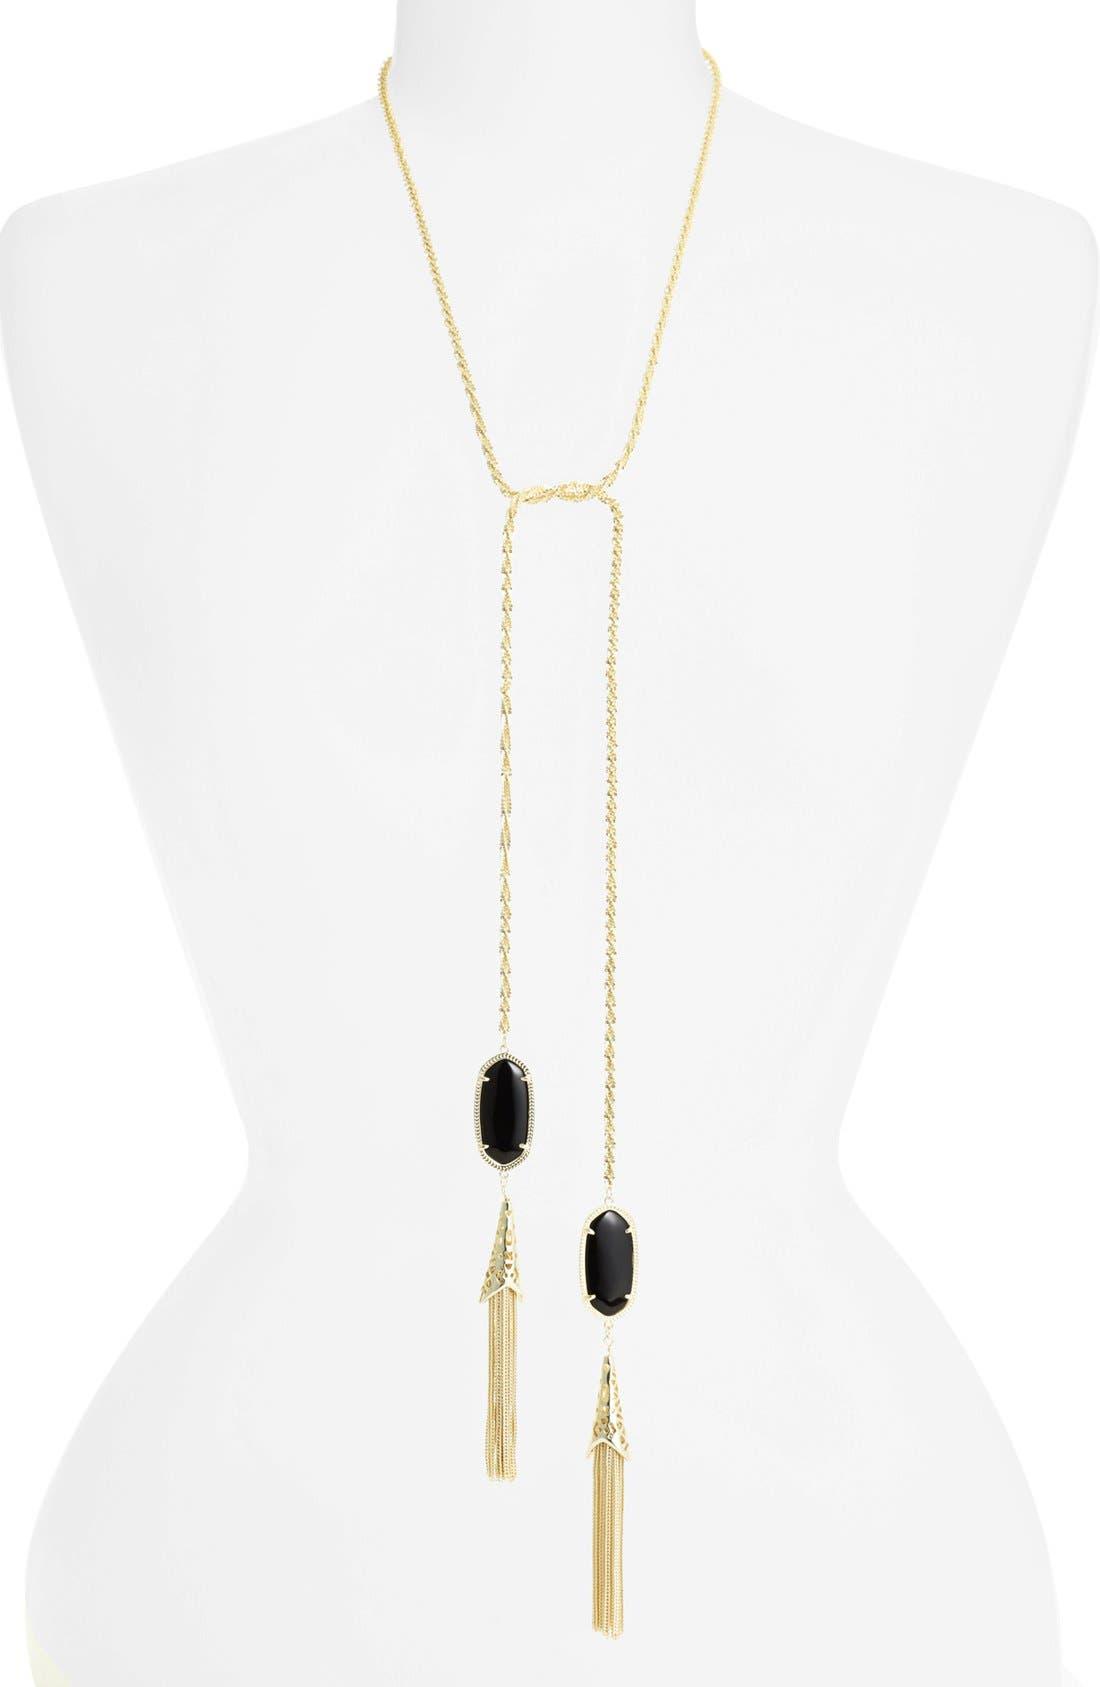 Alternate Image 1 Selected - Kendra Scott 'Megan' Oval Stone & Fringe Chain Necklace